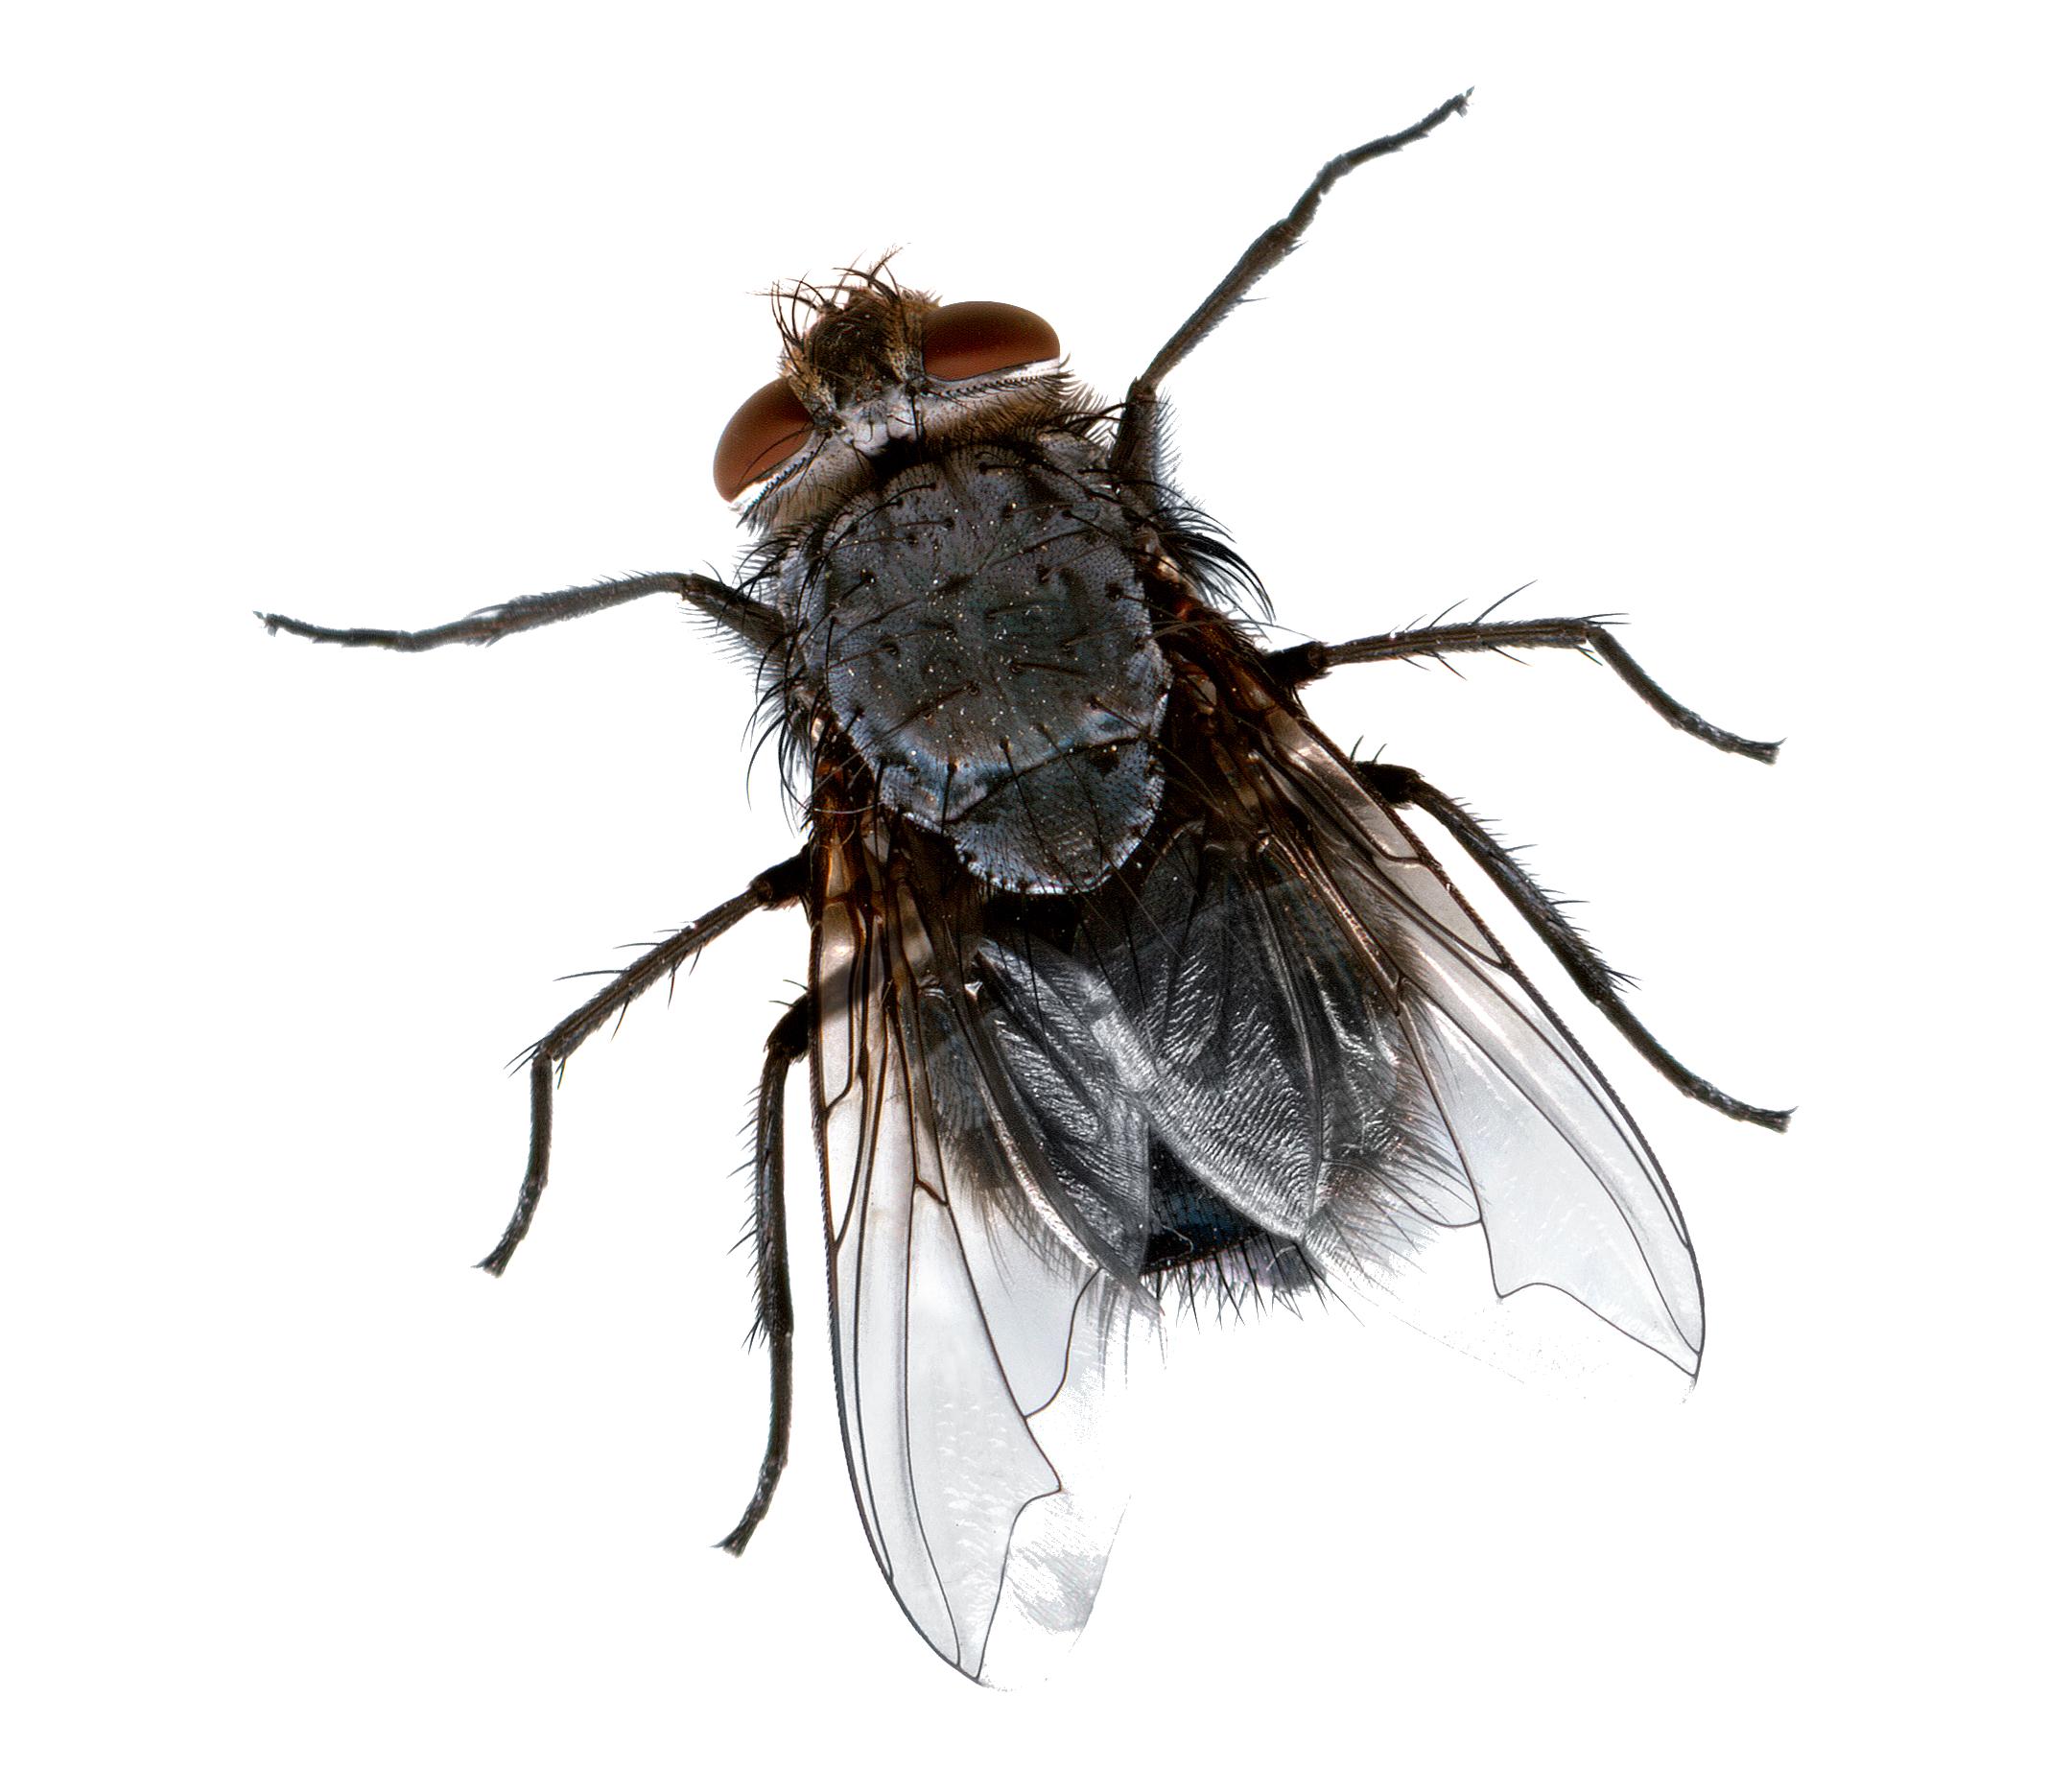 Flies PNG Images Transparent Free Download.